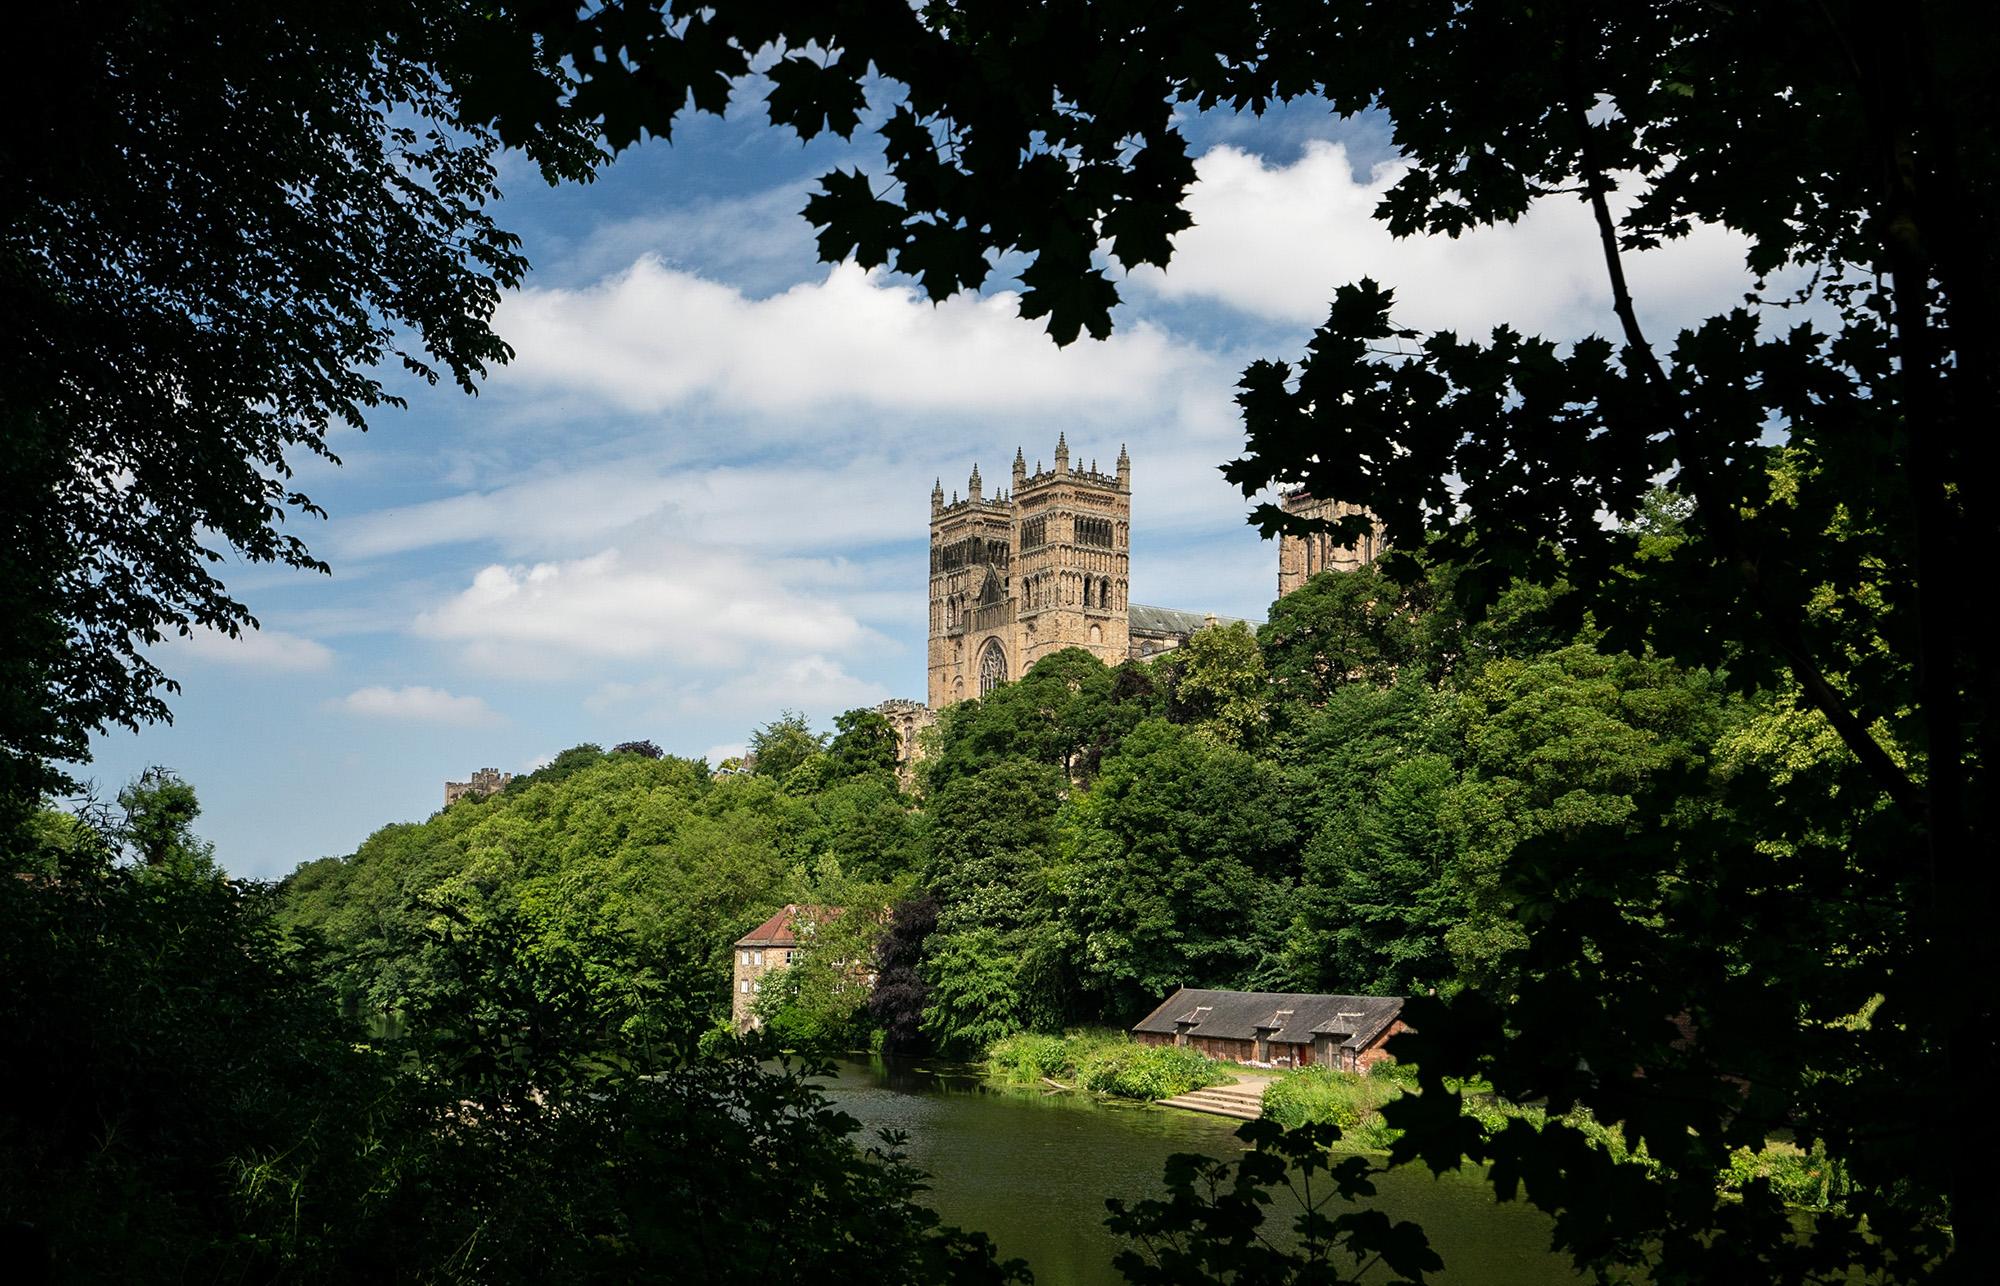 #durham, #durhamcathedral, #durham, #wear, #riverwear, #riverside, #walk, #summer, #trees, #northumbria, #northumberland, #england, #travel, #travelphotography